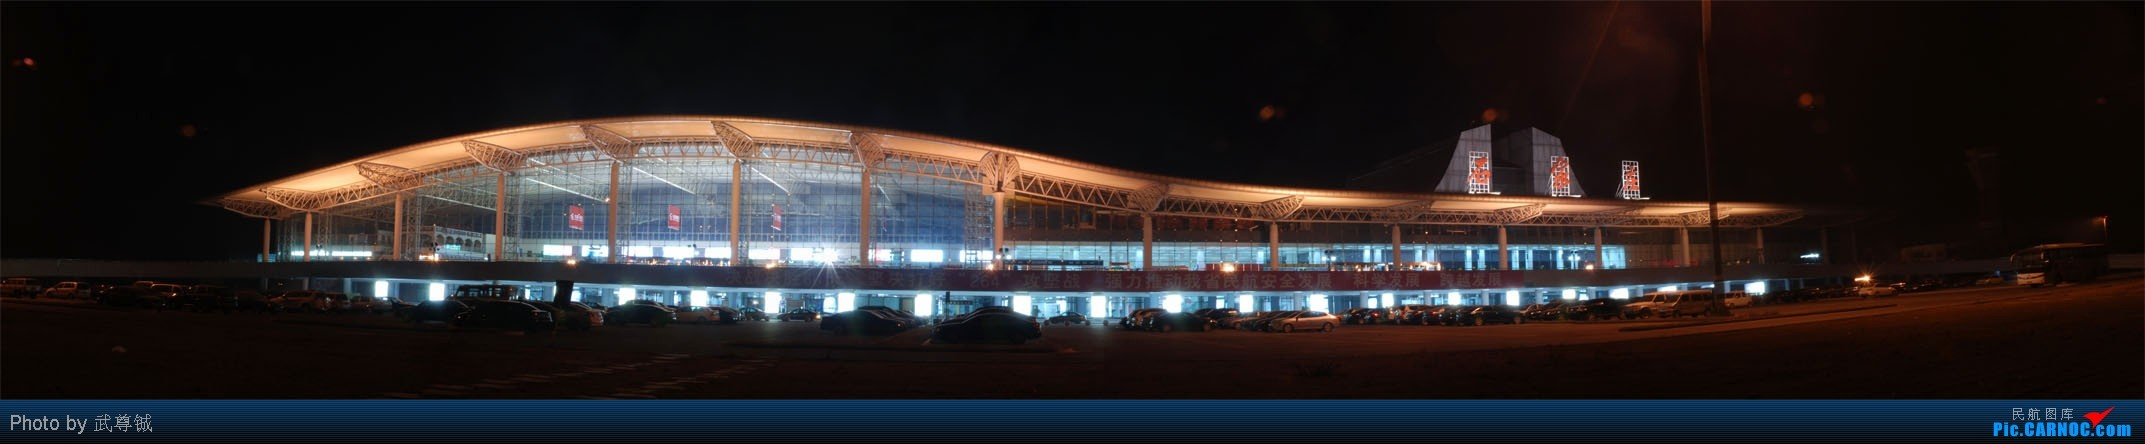 Re:[原创]【sjw】石家庄正定国际机场夜景(有全景宽幅)    中国石家庄正定机场